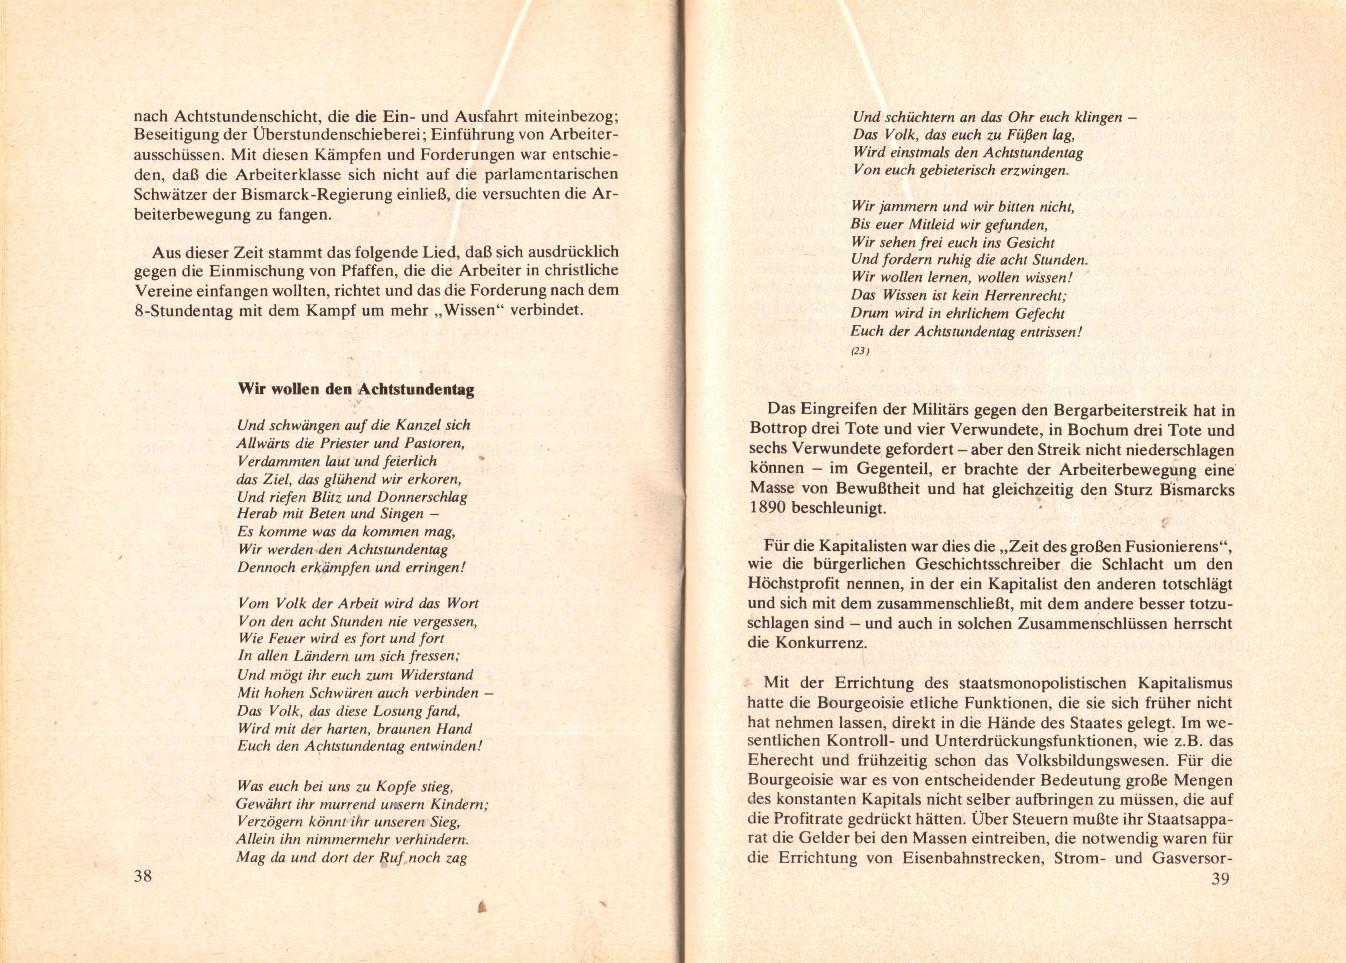 NRW_KBW_1977_Politik_der_Kohle_u_Stahlbarone_21